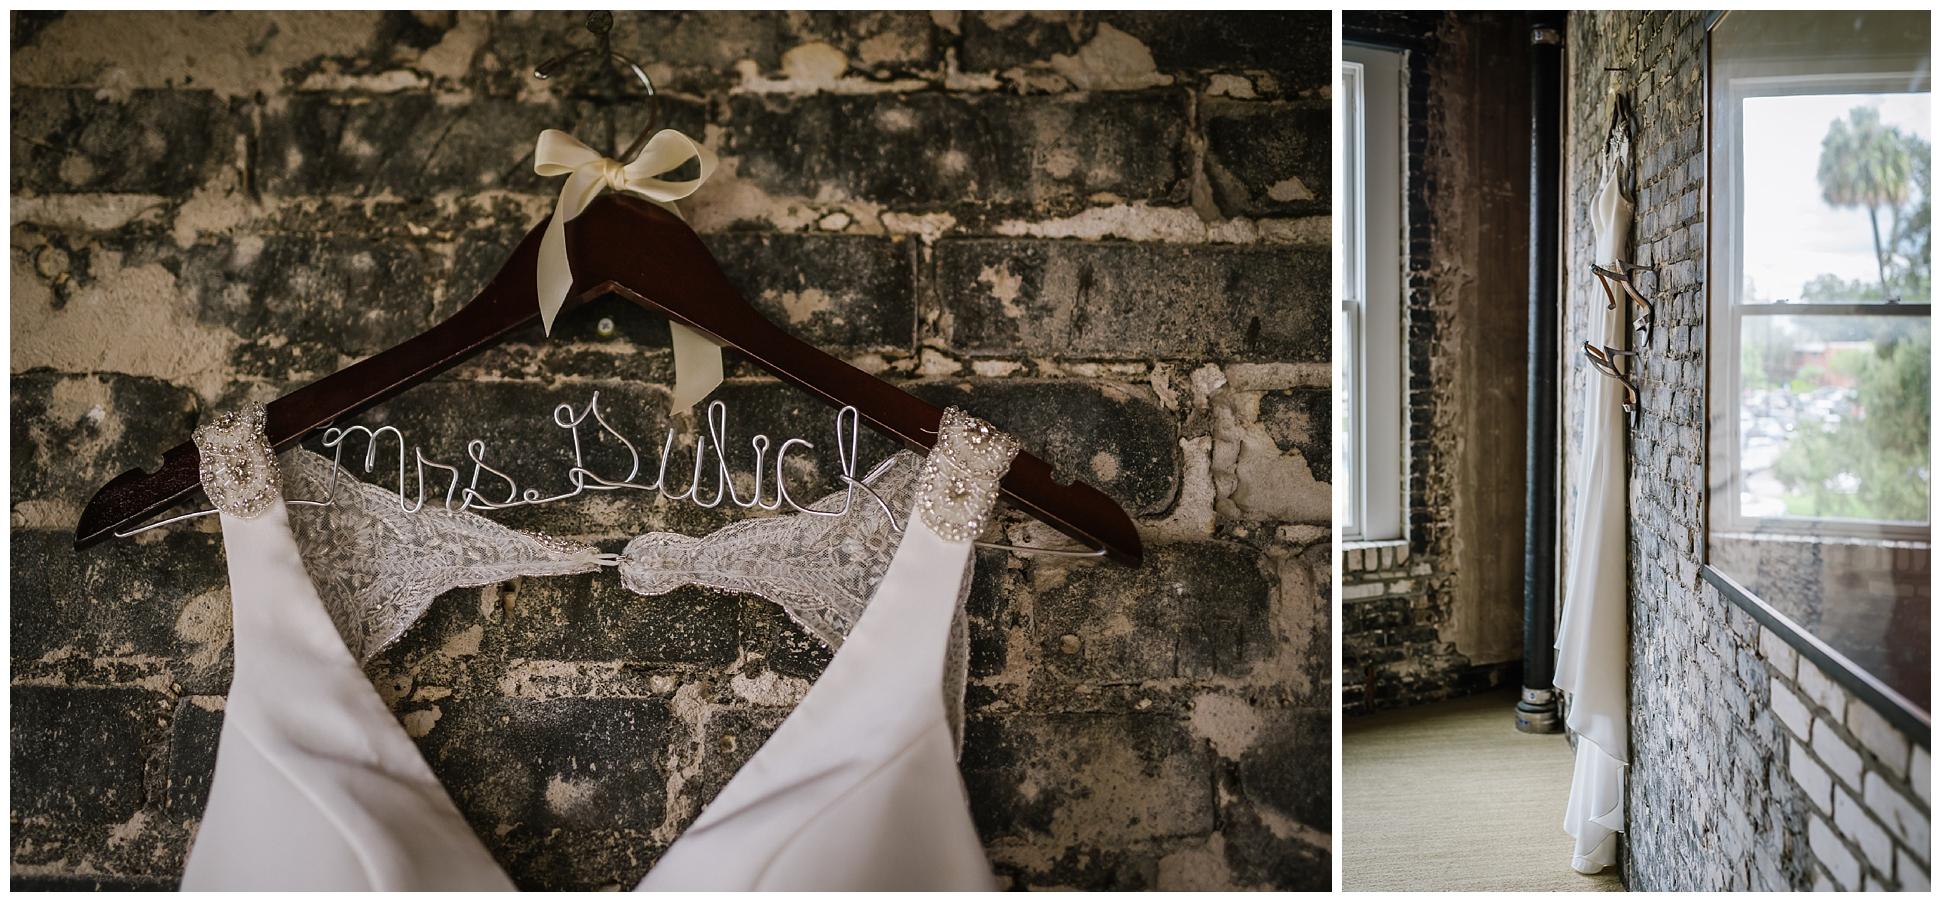 Oxford-exchange-wedding-photogapher-garland-candels-bookstore-burgandy-botanica_0005.jpg